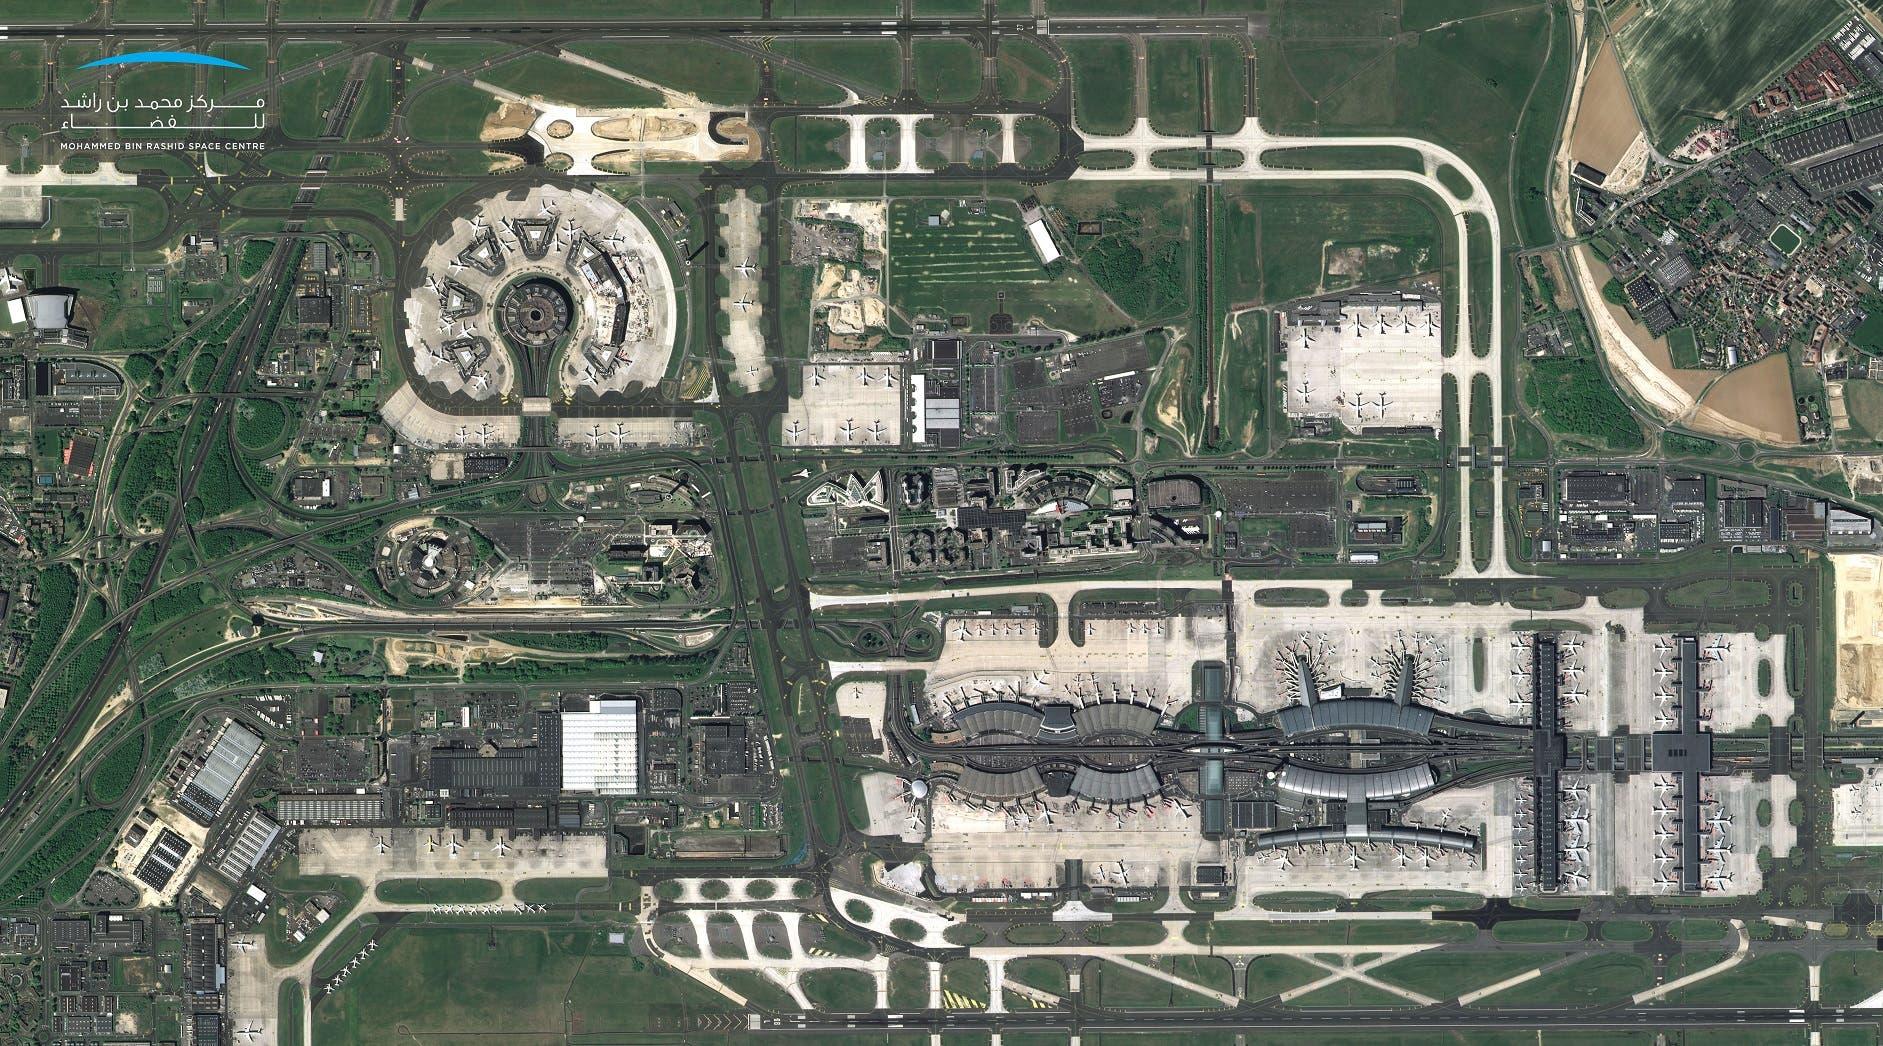 Paris-Charles de Gaulle Airport, France taken by KhalifaSat. (Supplied/MBRSC)